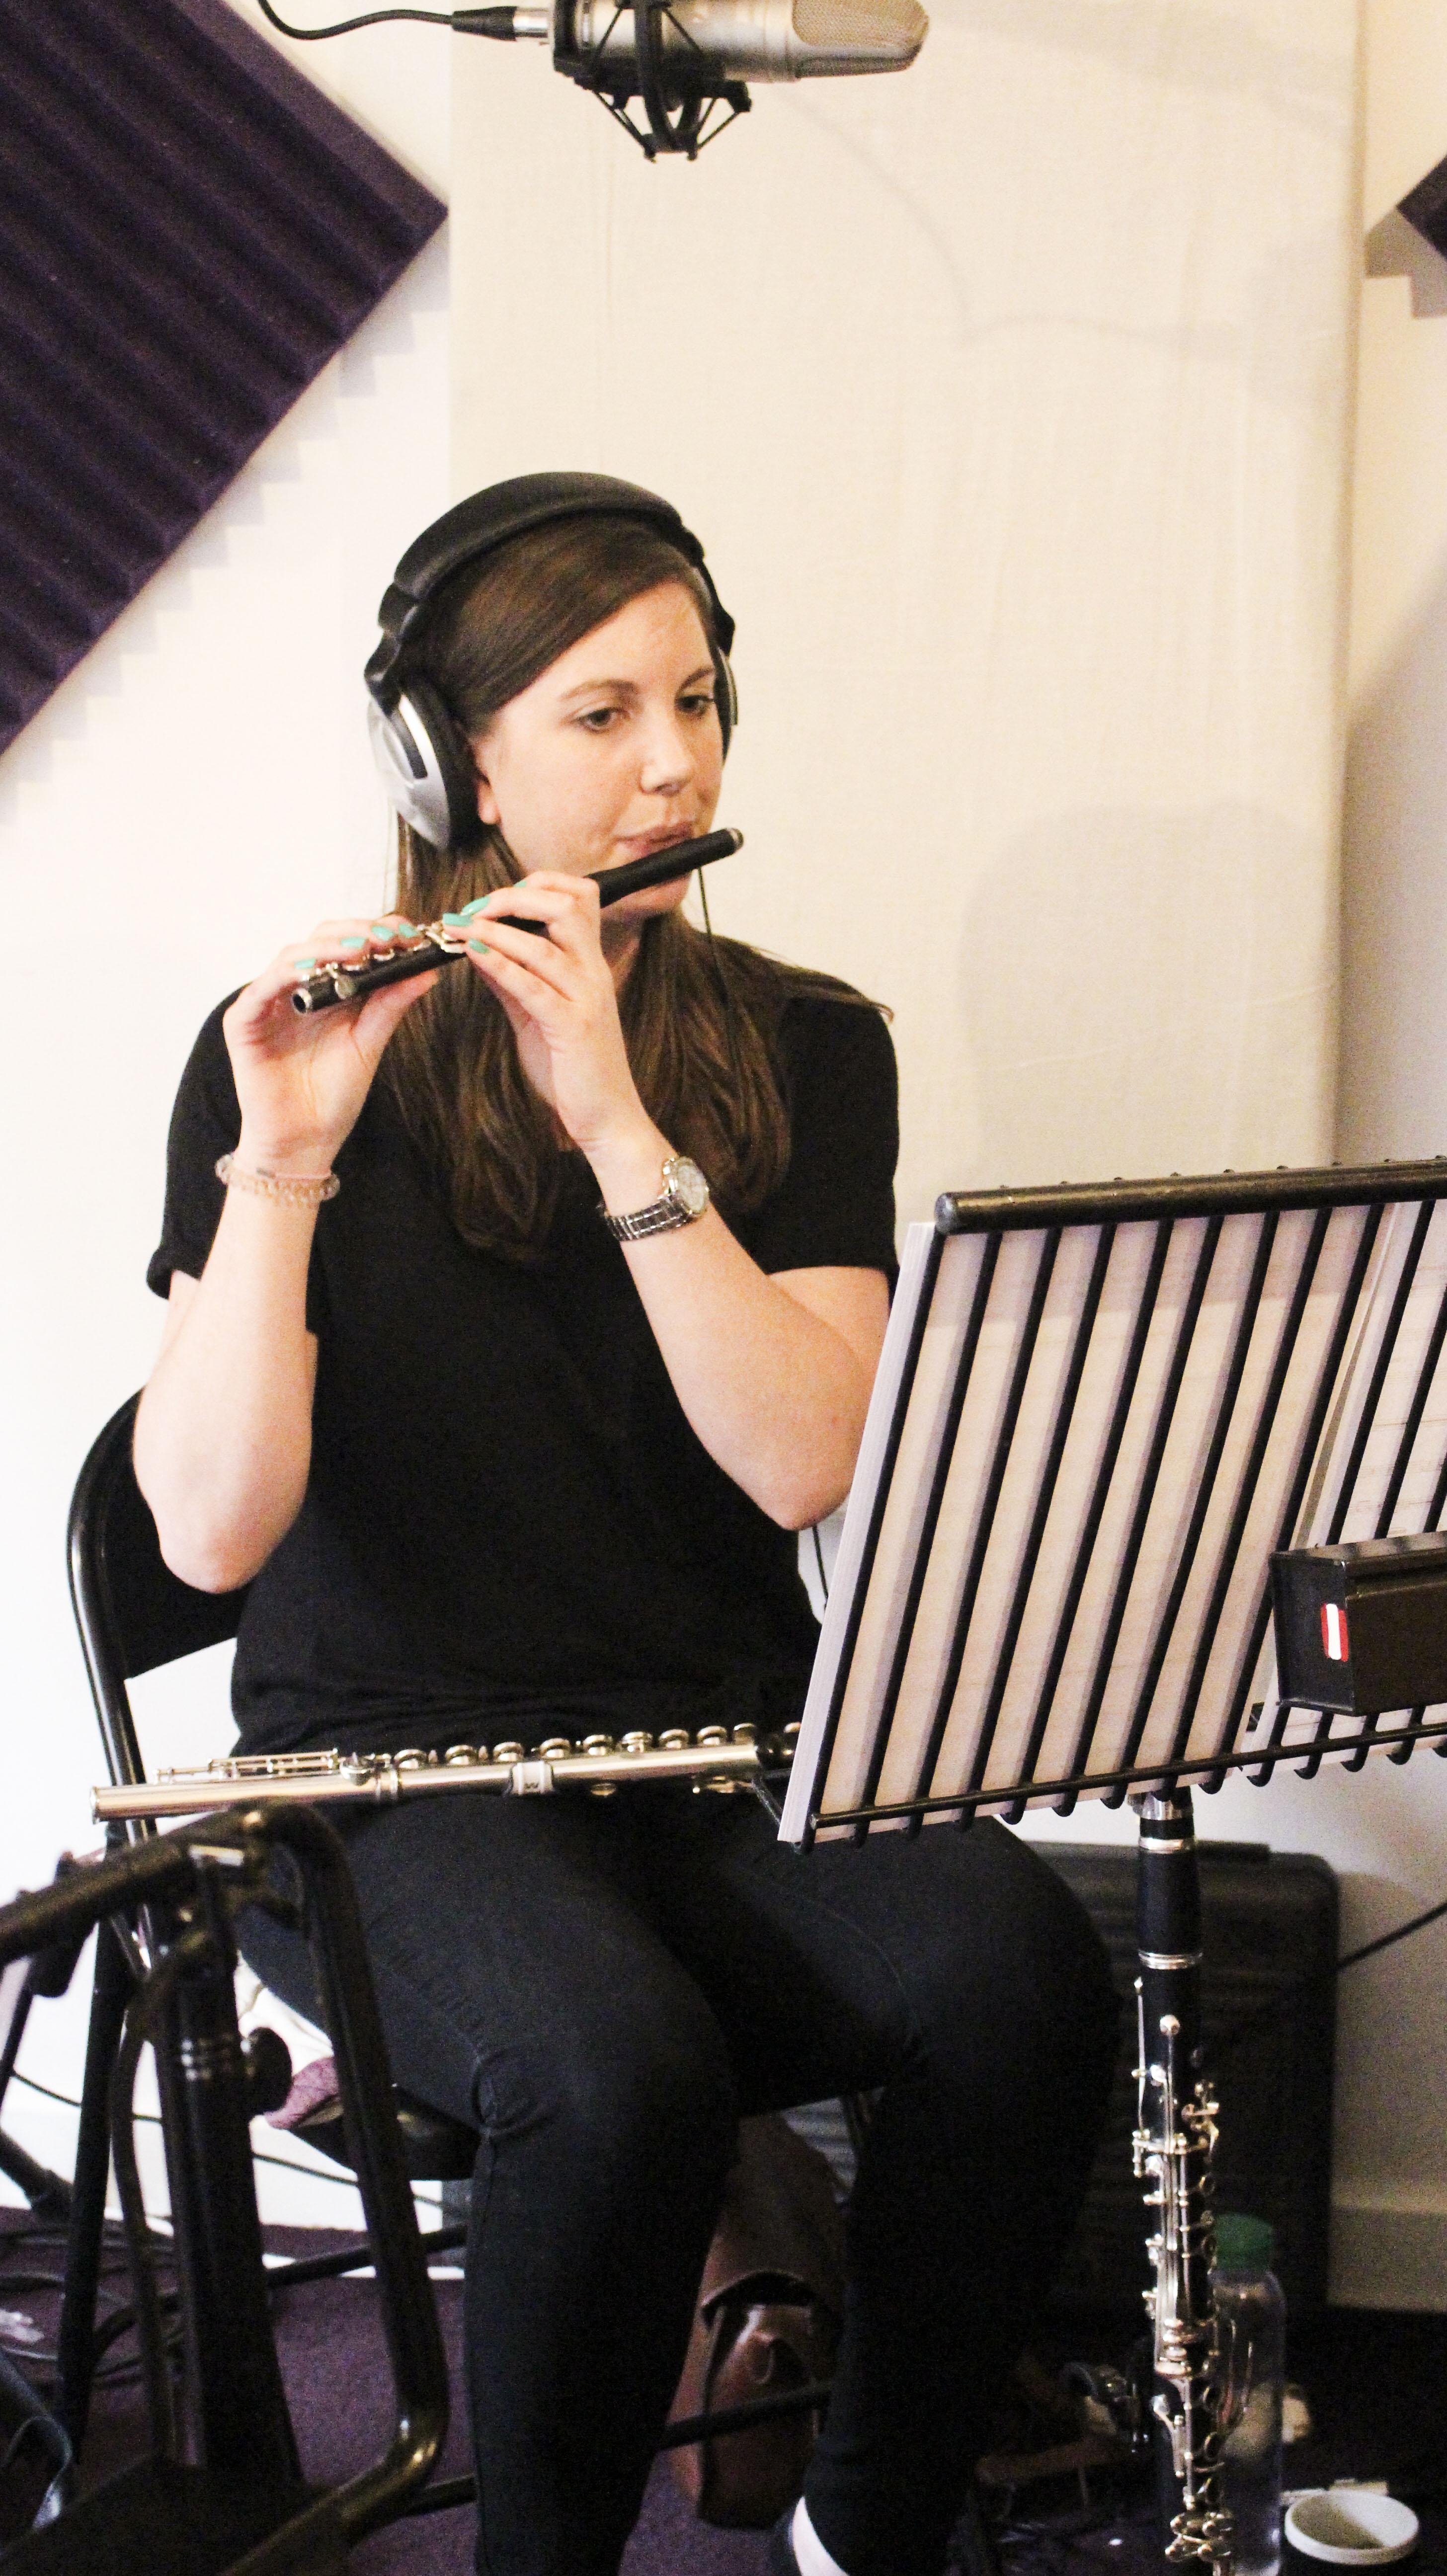 The Clockmaker's Daughter - Studio Cast Recording (CD)